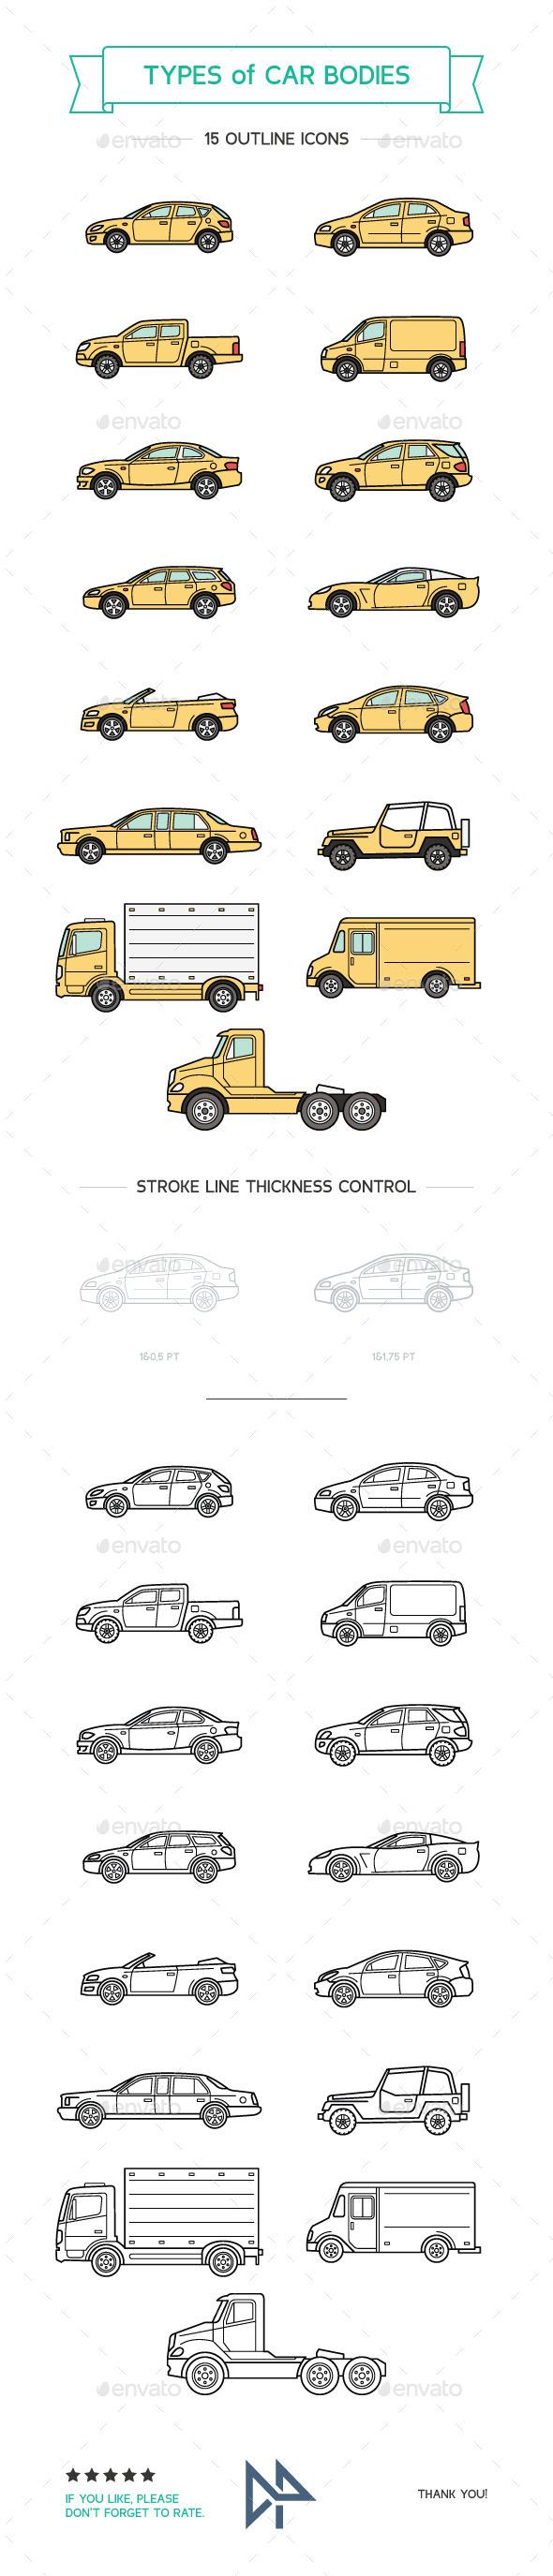 Types Of Car Bodies